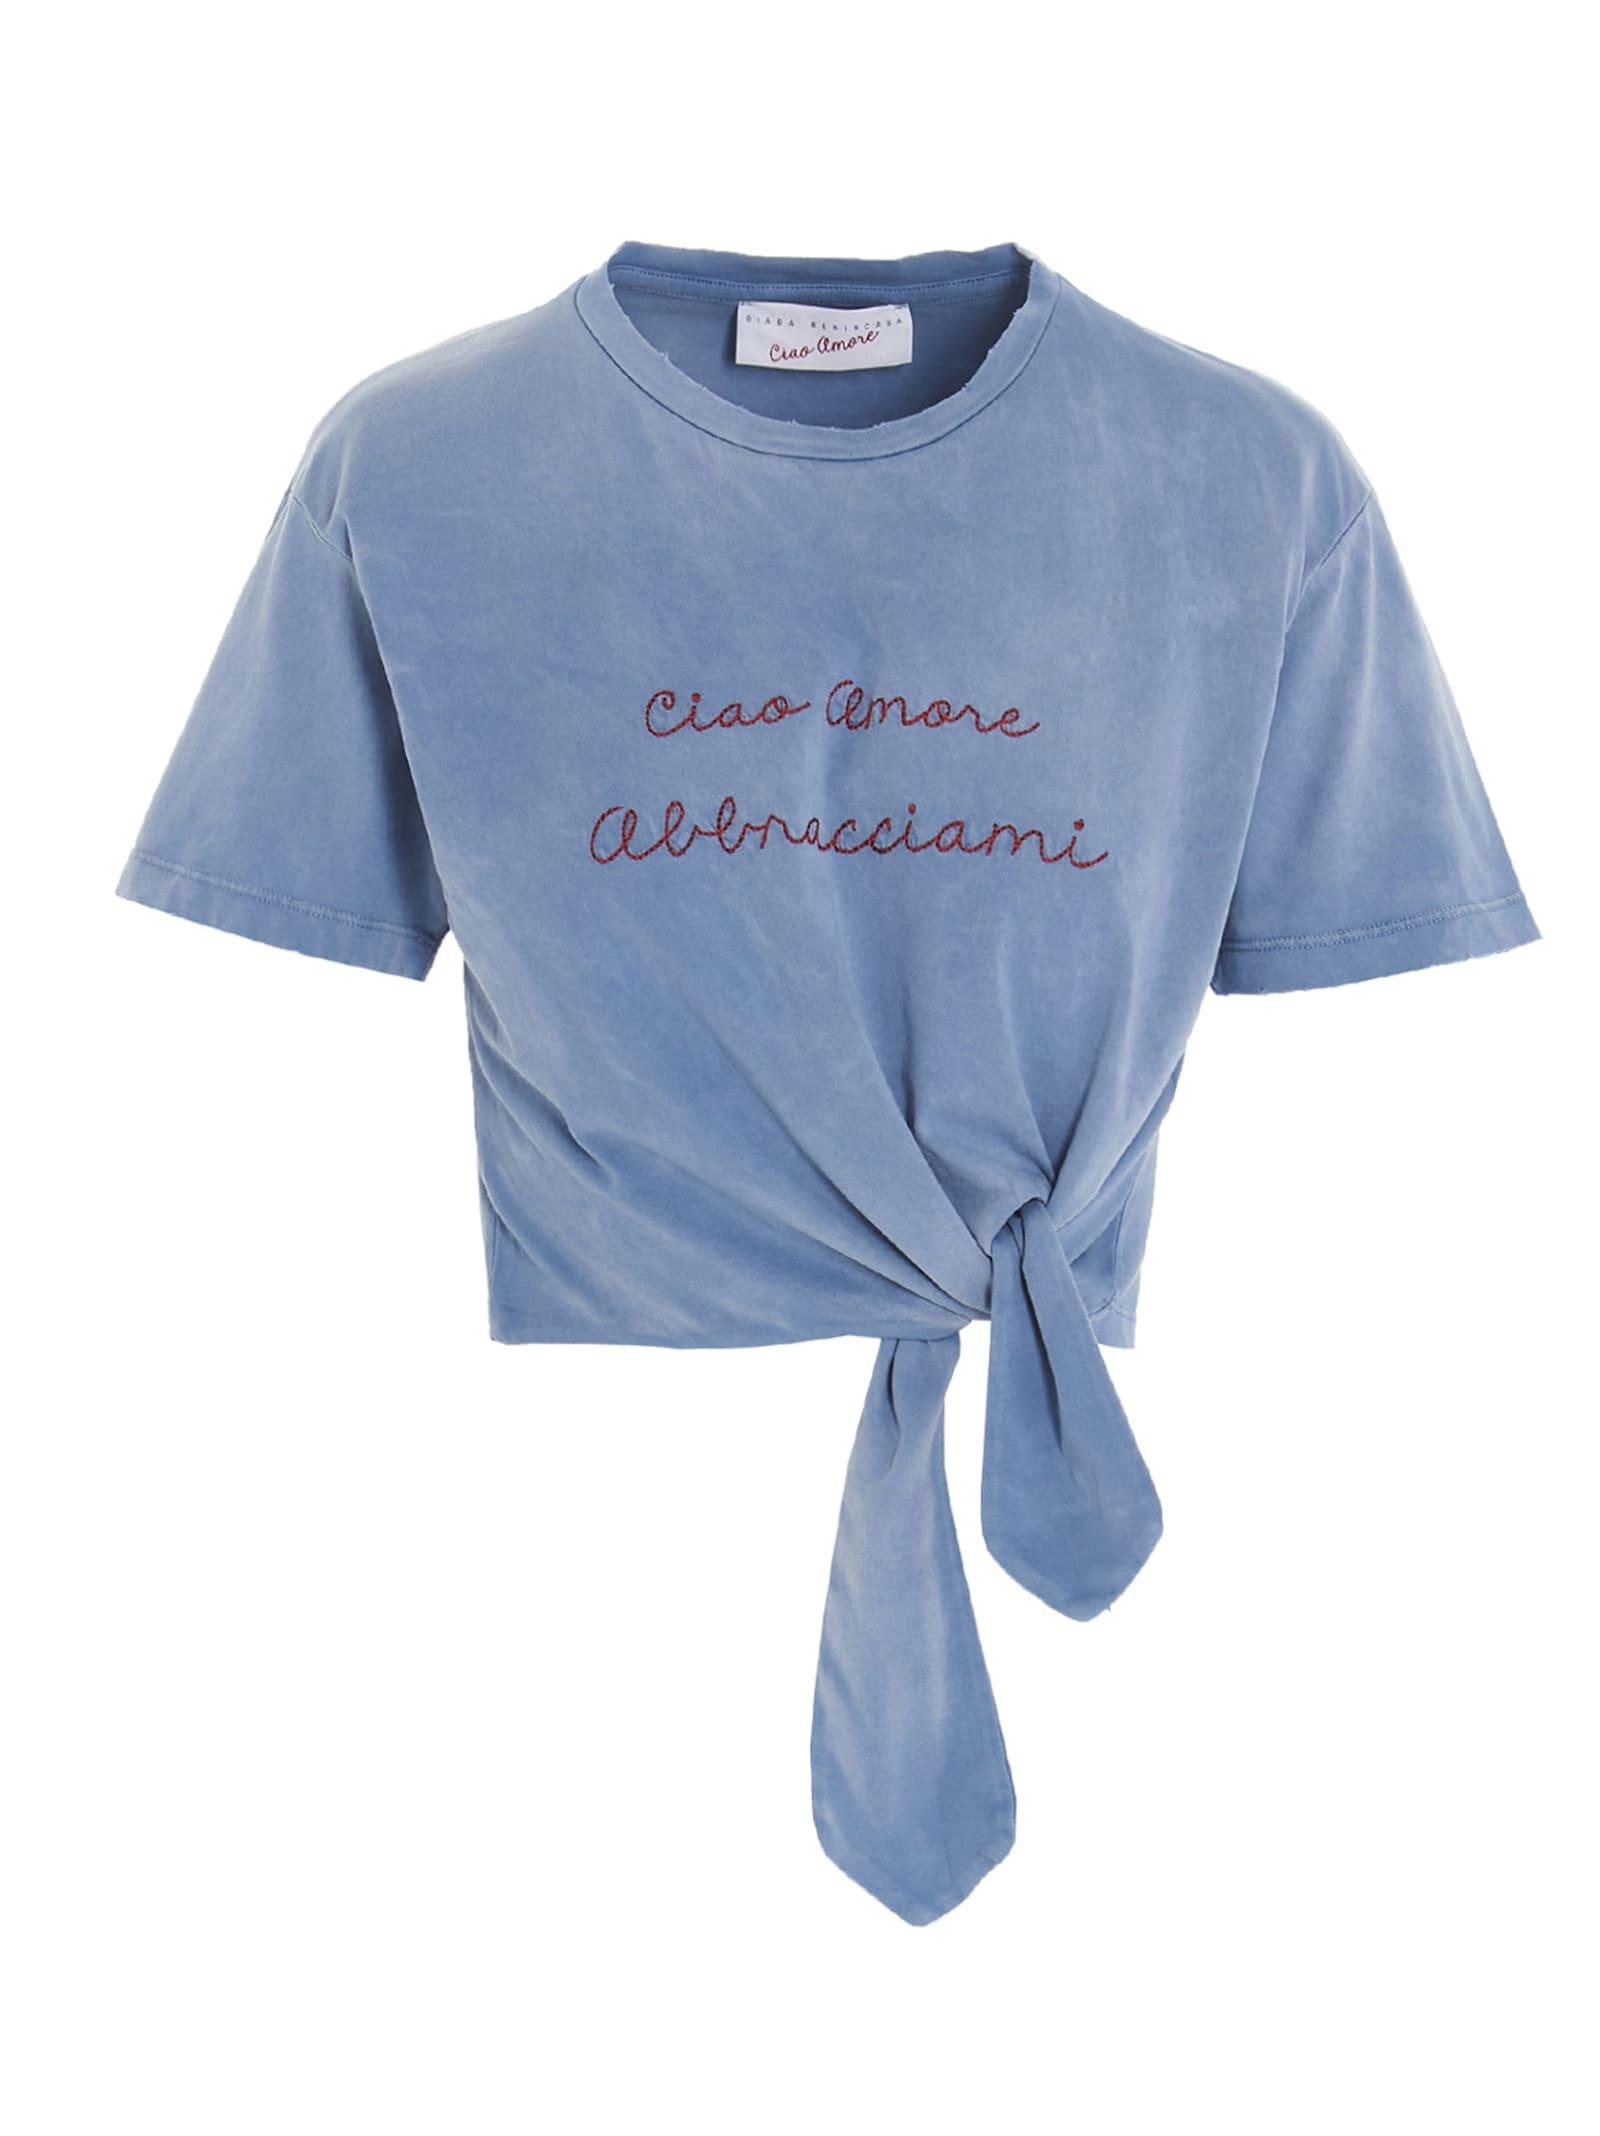 ciao Amore Abbracciami T-shirt